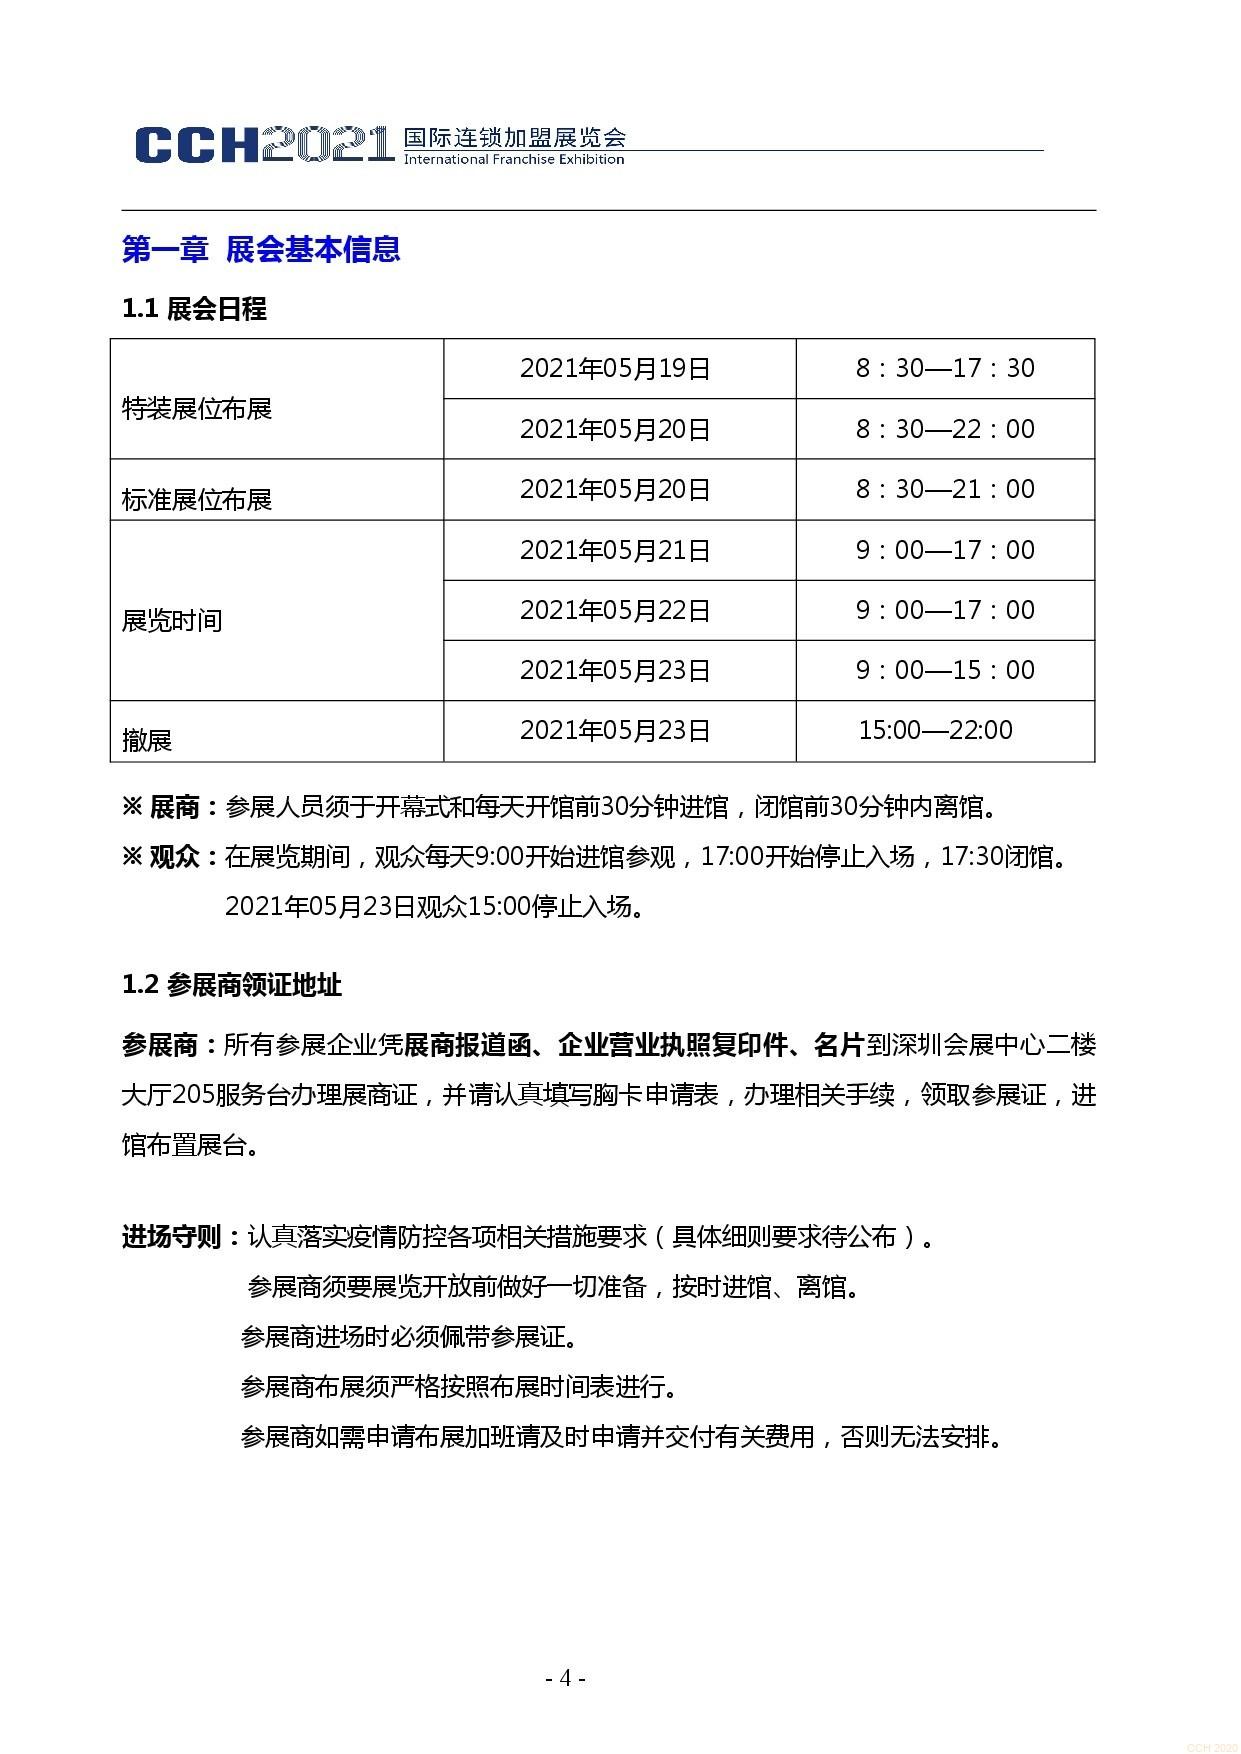 0416CCH深圳展参展商手册4.16-004.jpg